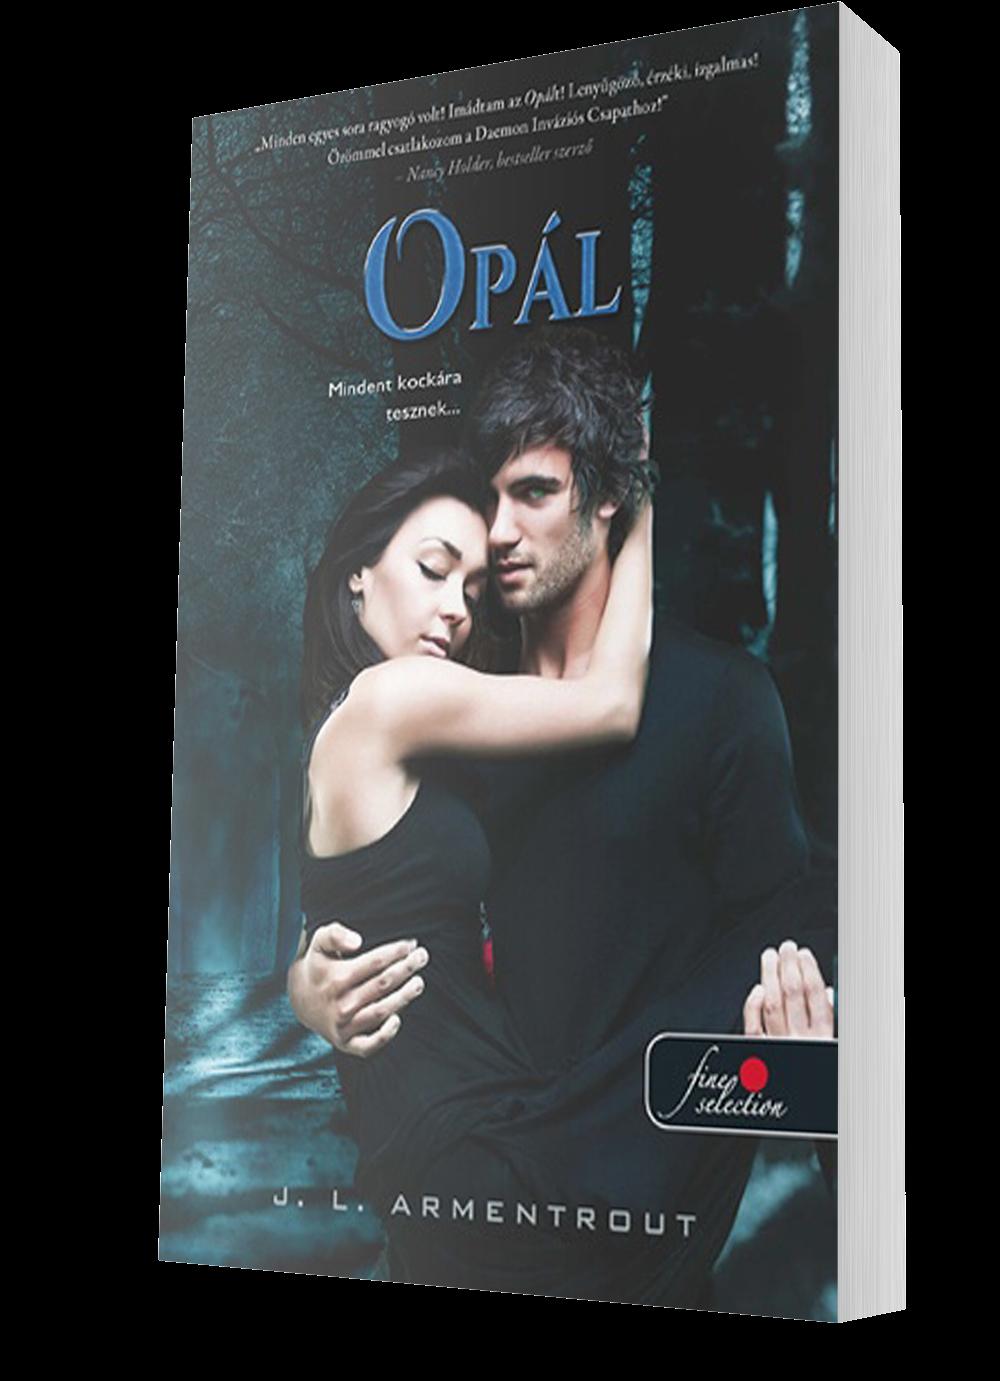 http://konyvmolykepzo.hu/products-page/konyv/jennifer-armentrout-opal-6669?ap_id=Kelly